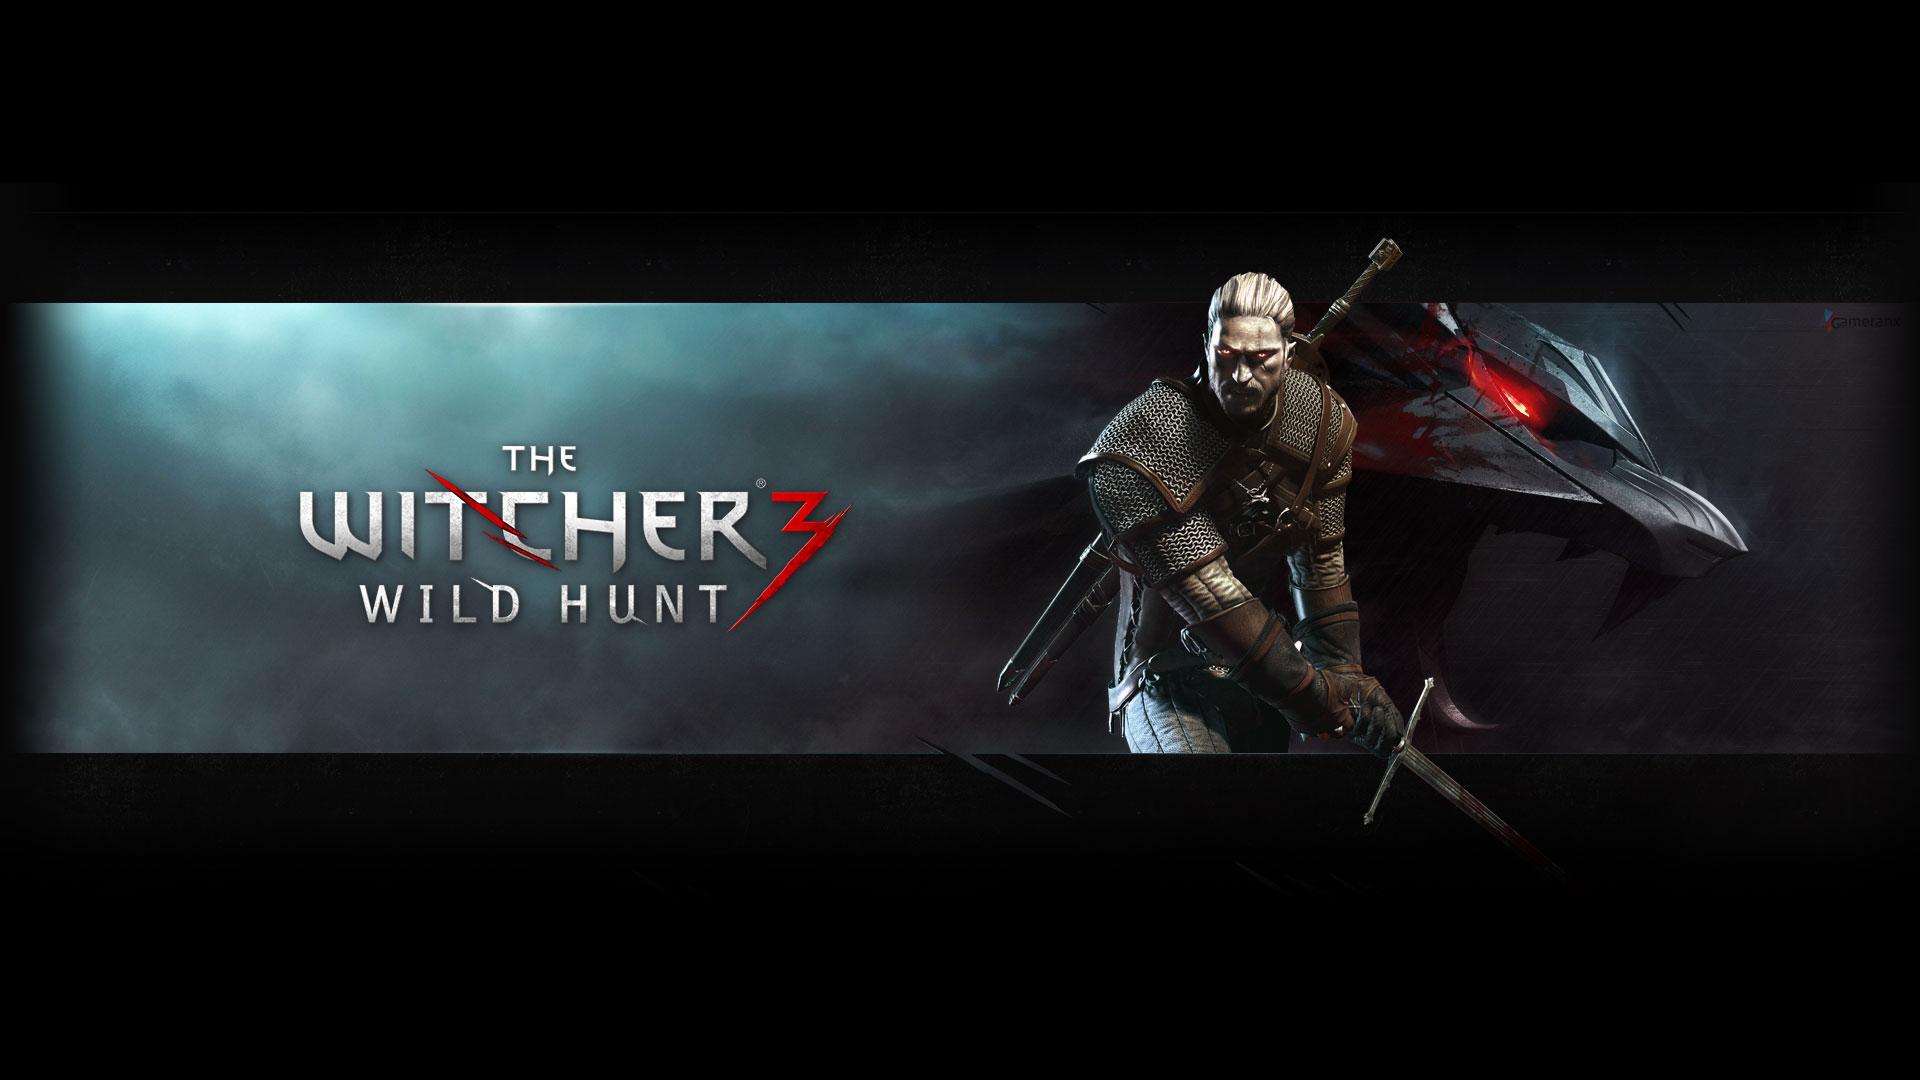 witcher-3-wild-hunt-hd-wallpaper-3